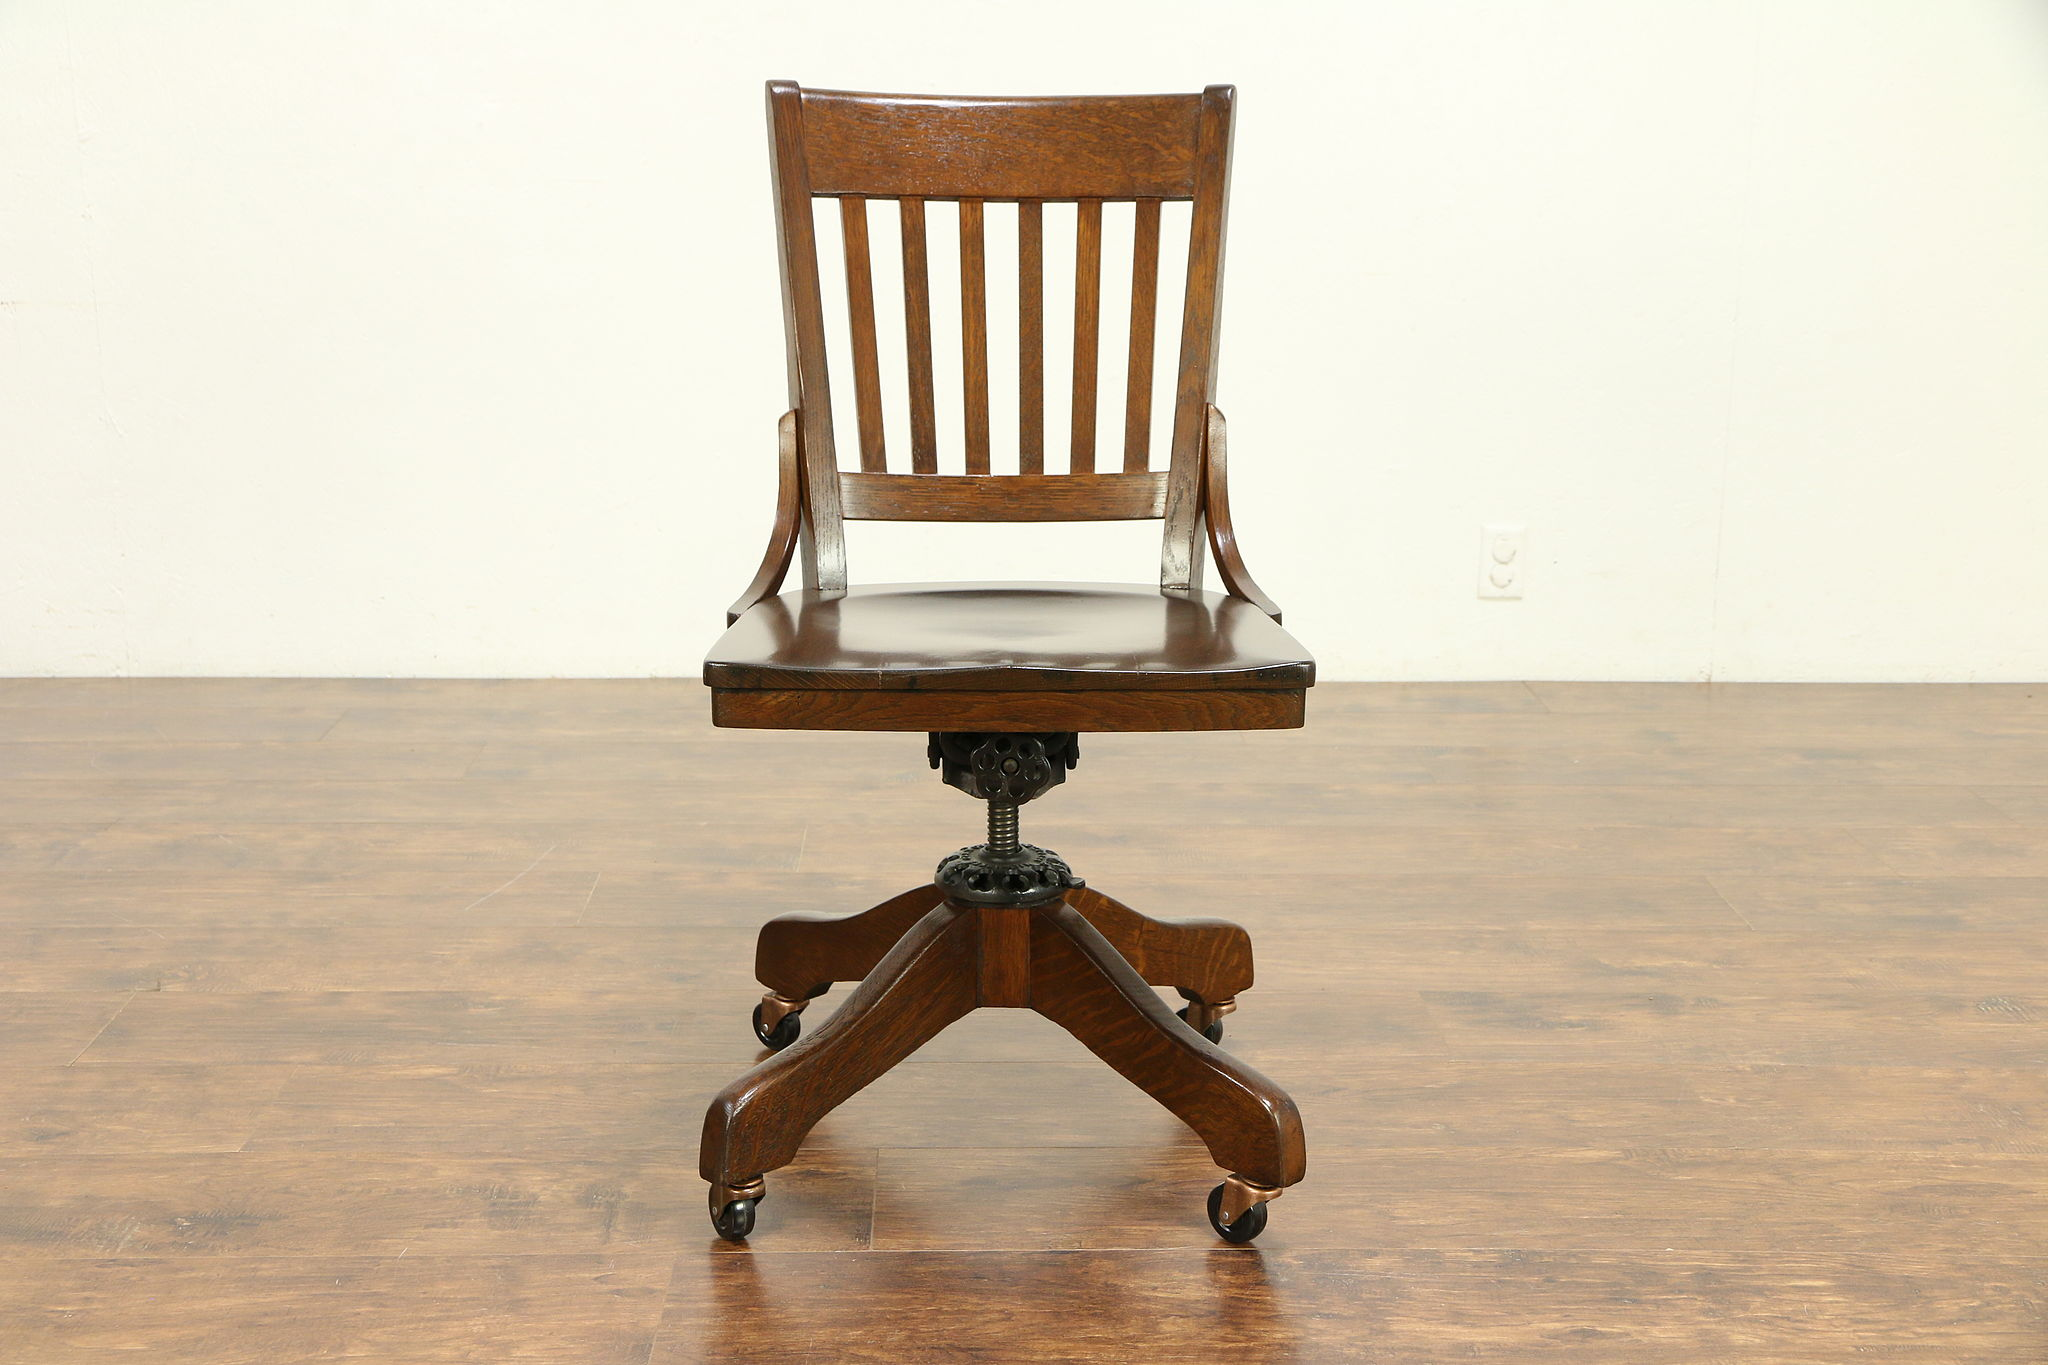 Superb Oak Antique Swivel Adjustable Desk Chair Dated 1928 Signed Milwaukee 30332 Uwap Interior Chair Design Uwaporg